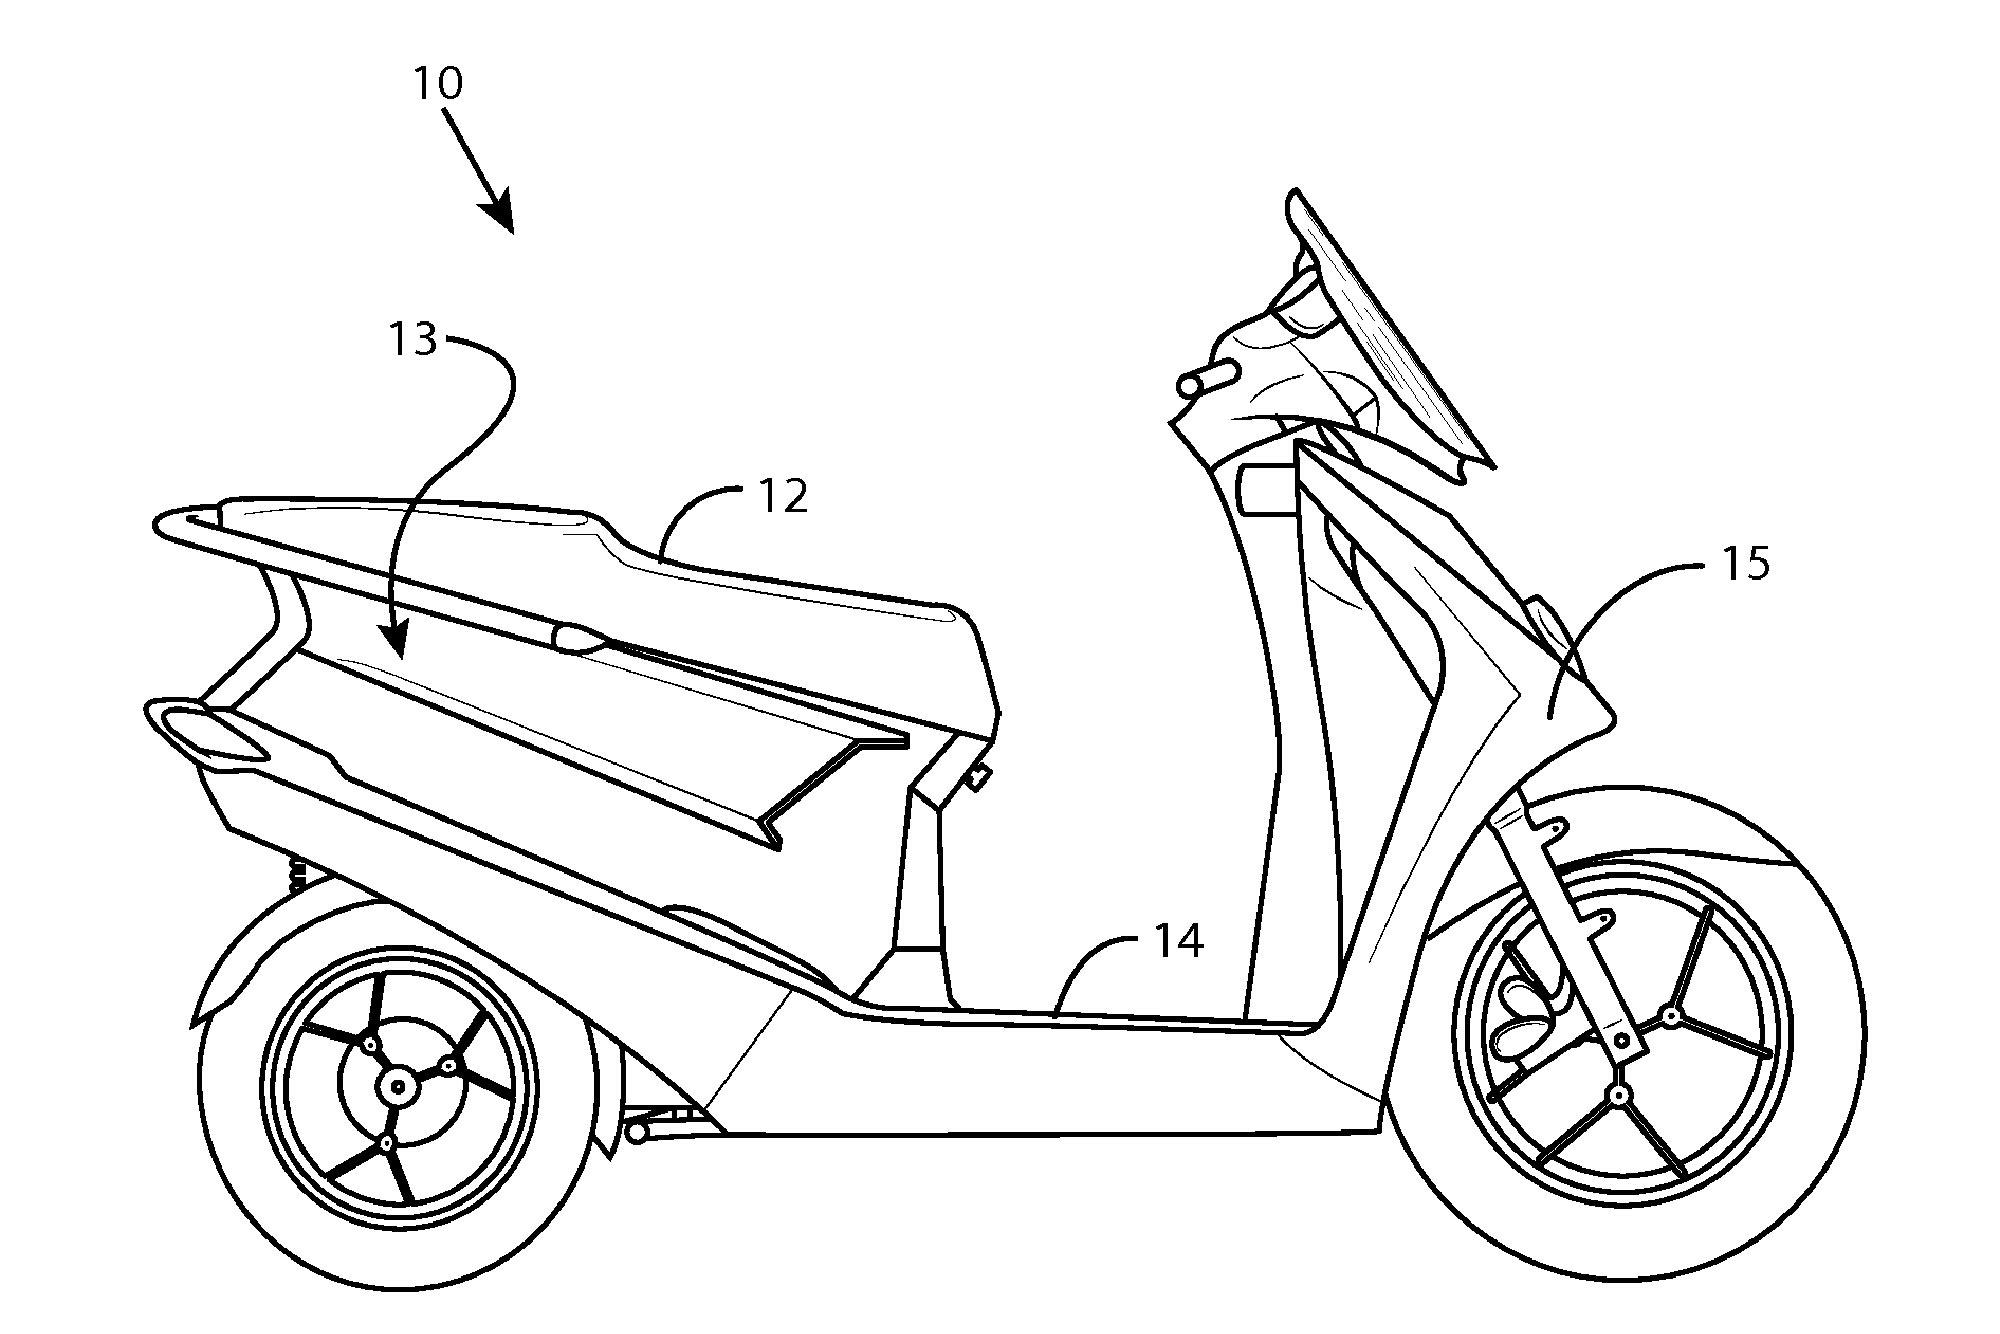 Erik Buell Racing Patents Hybrid Motorcycle Design